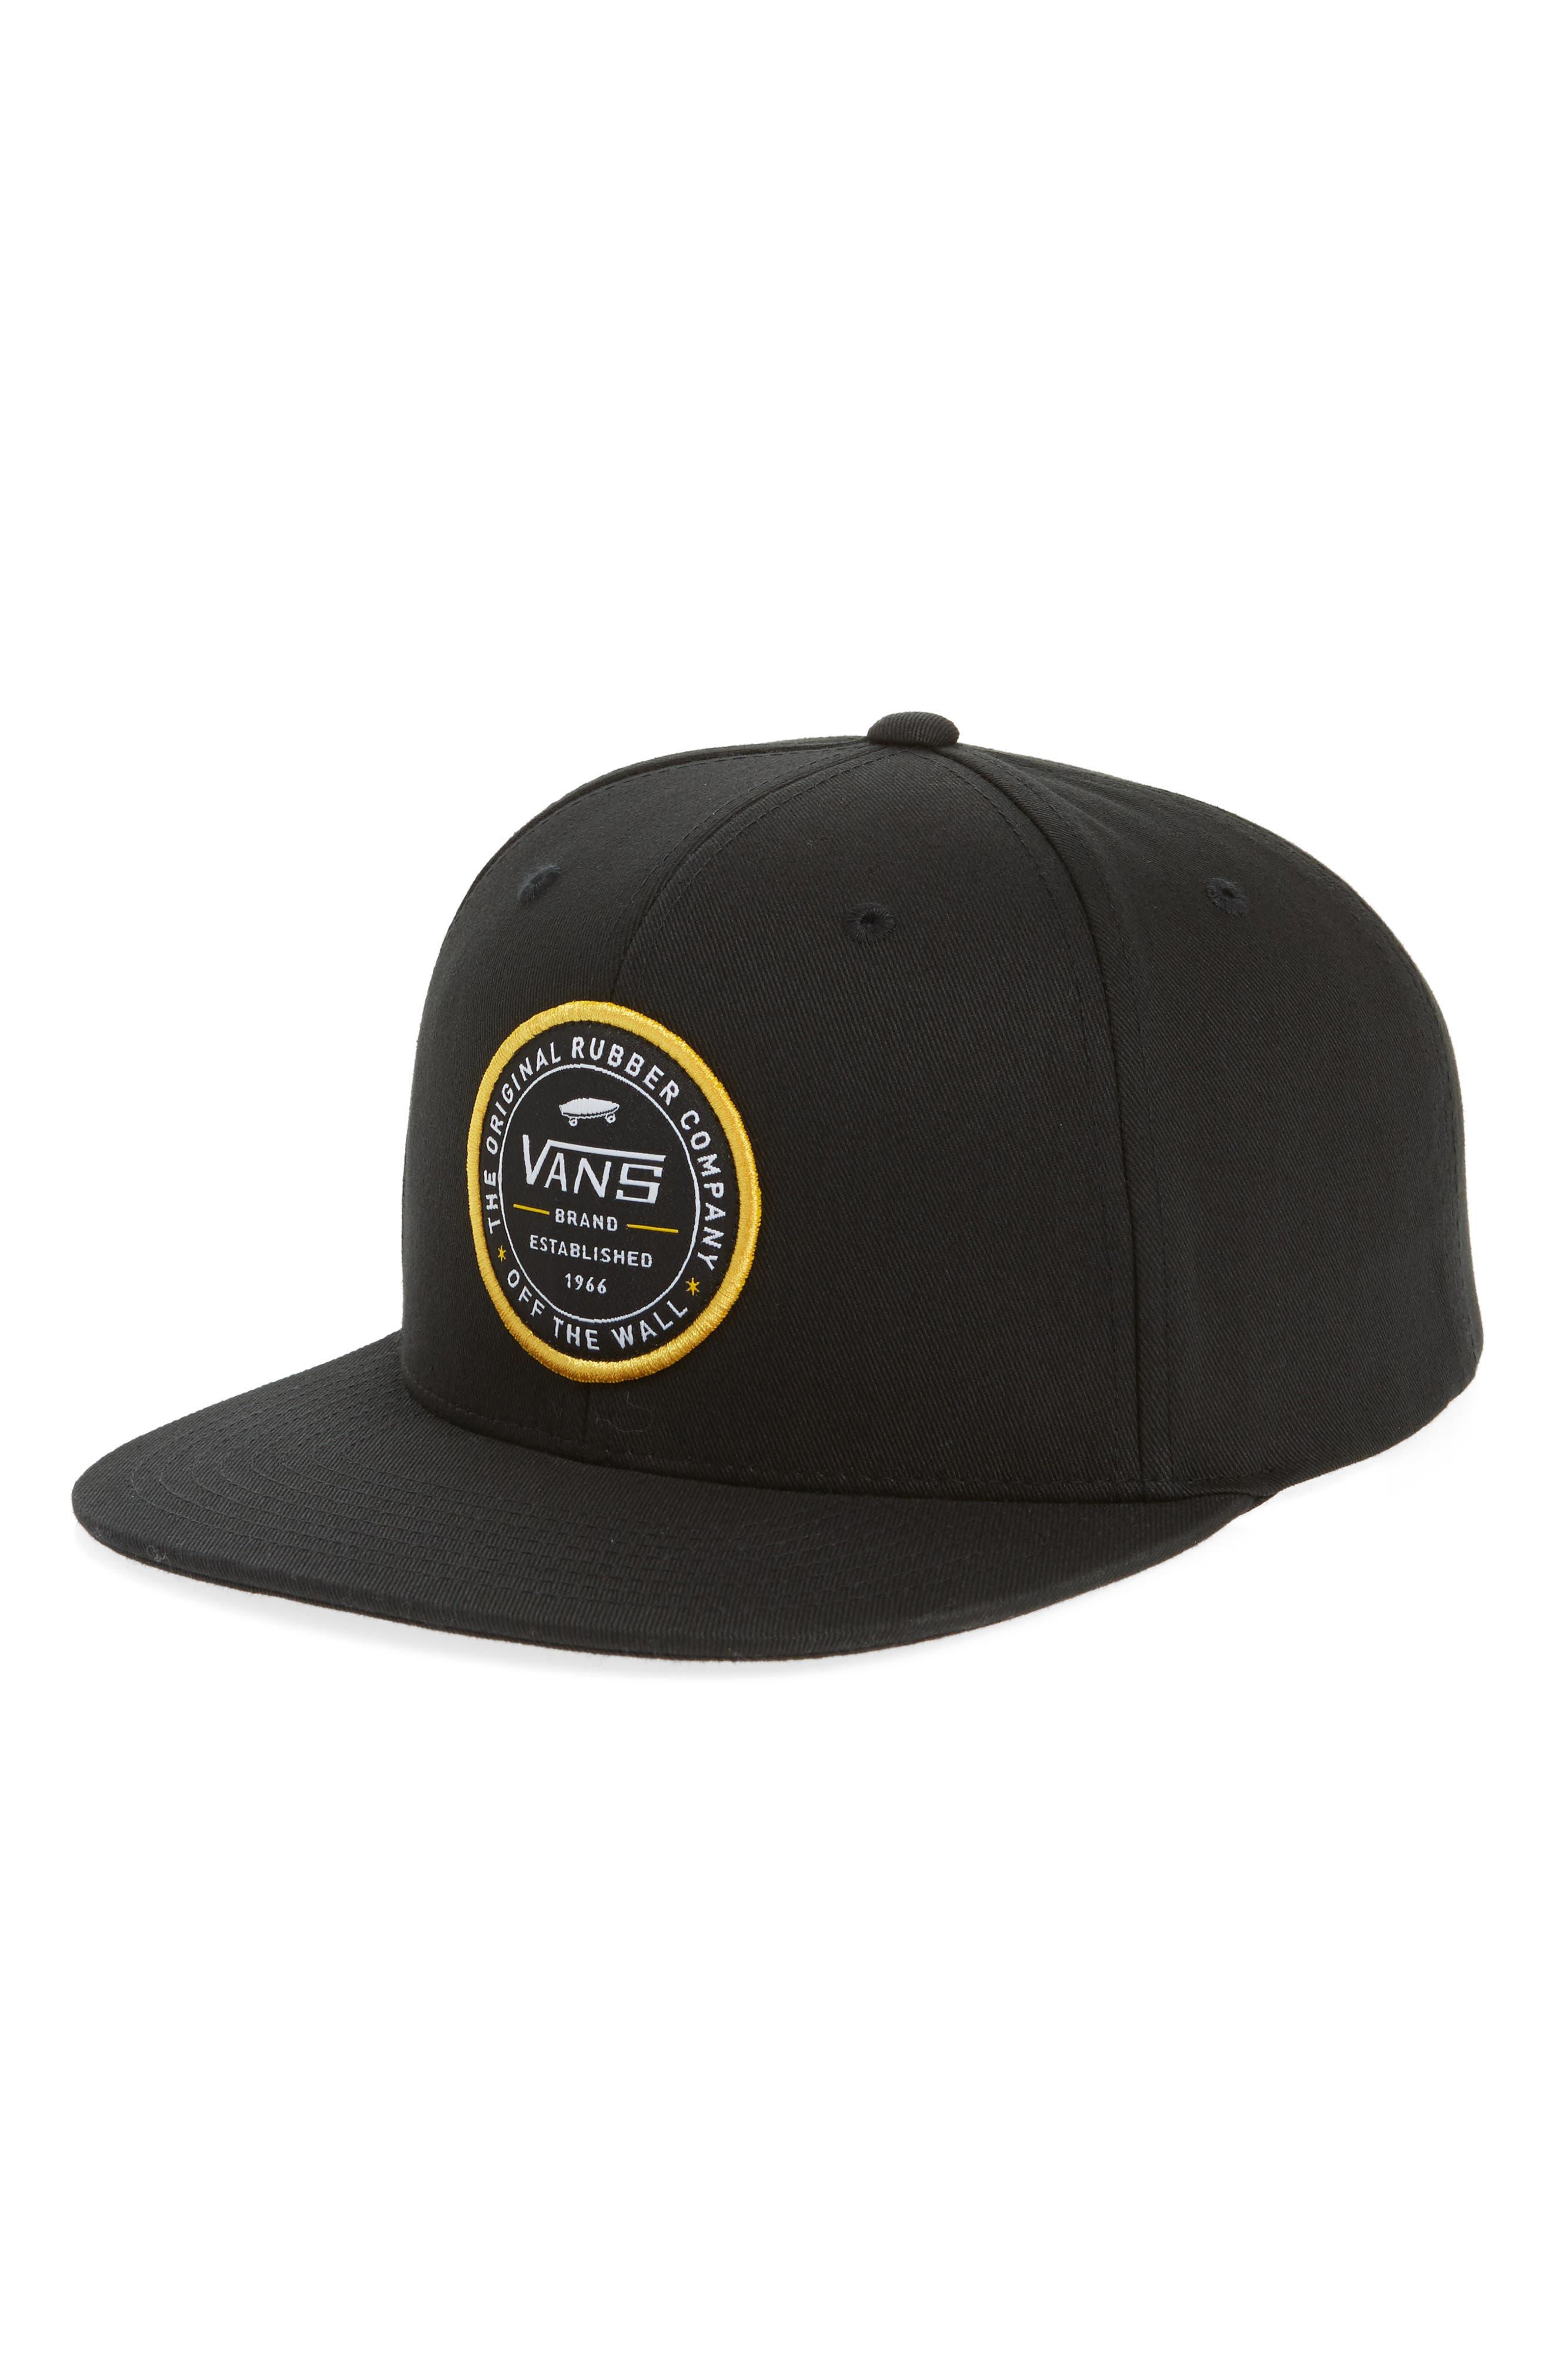 Established 66 Snapback Baseball Cap,                         Main,                         color, 001